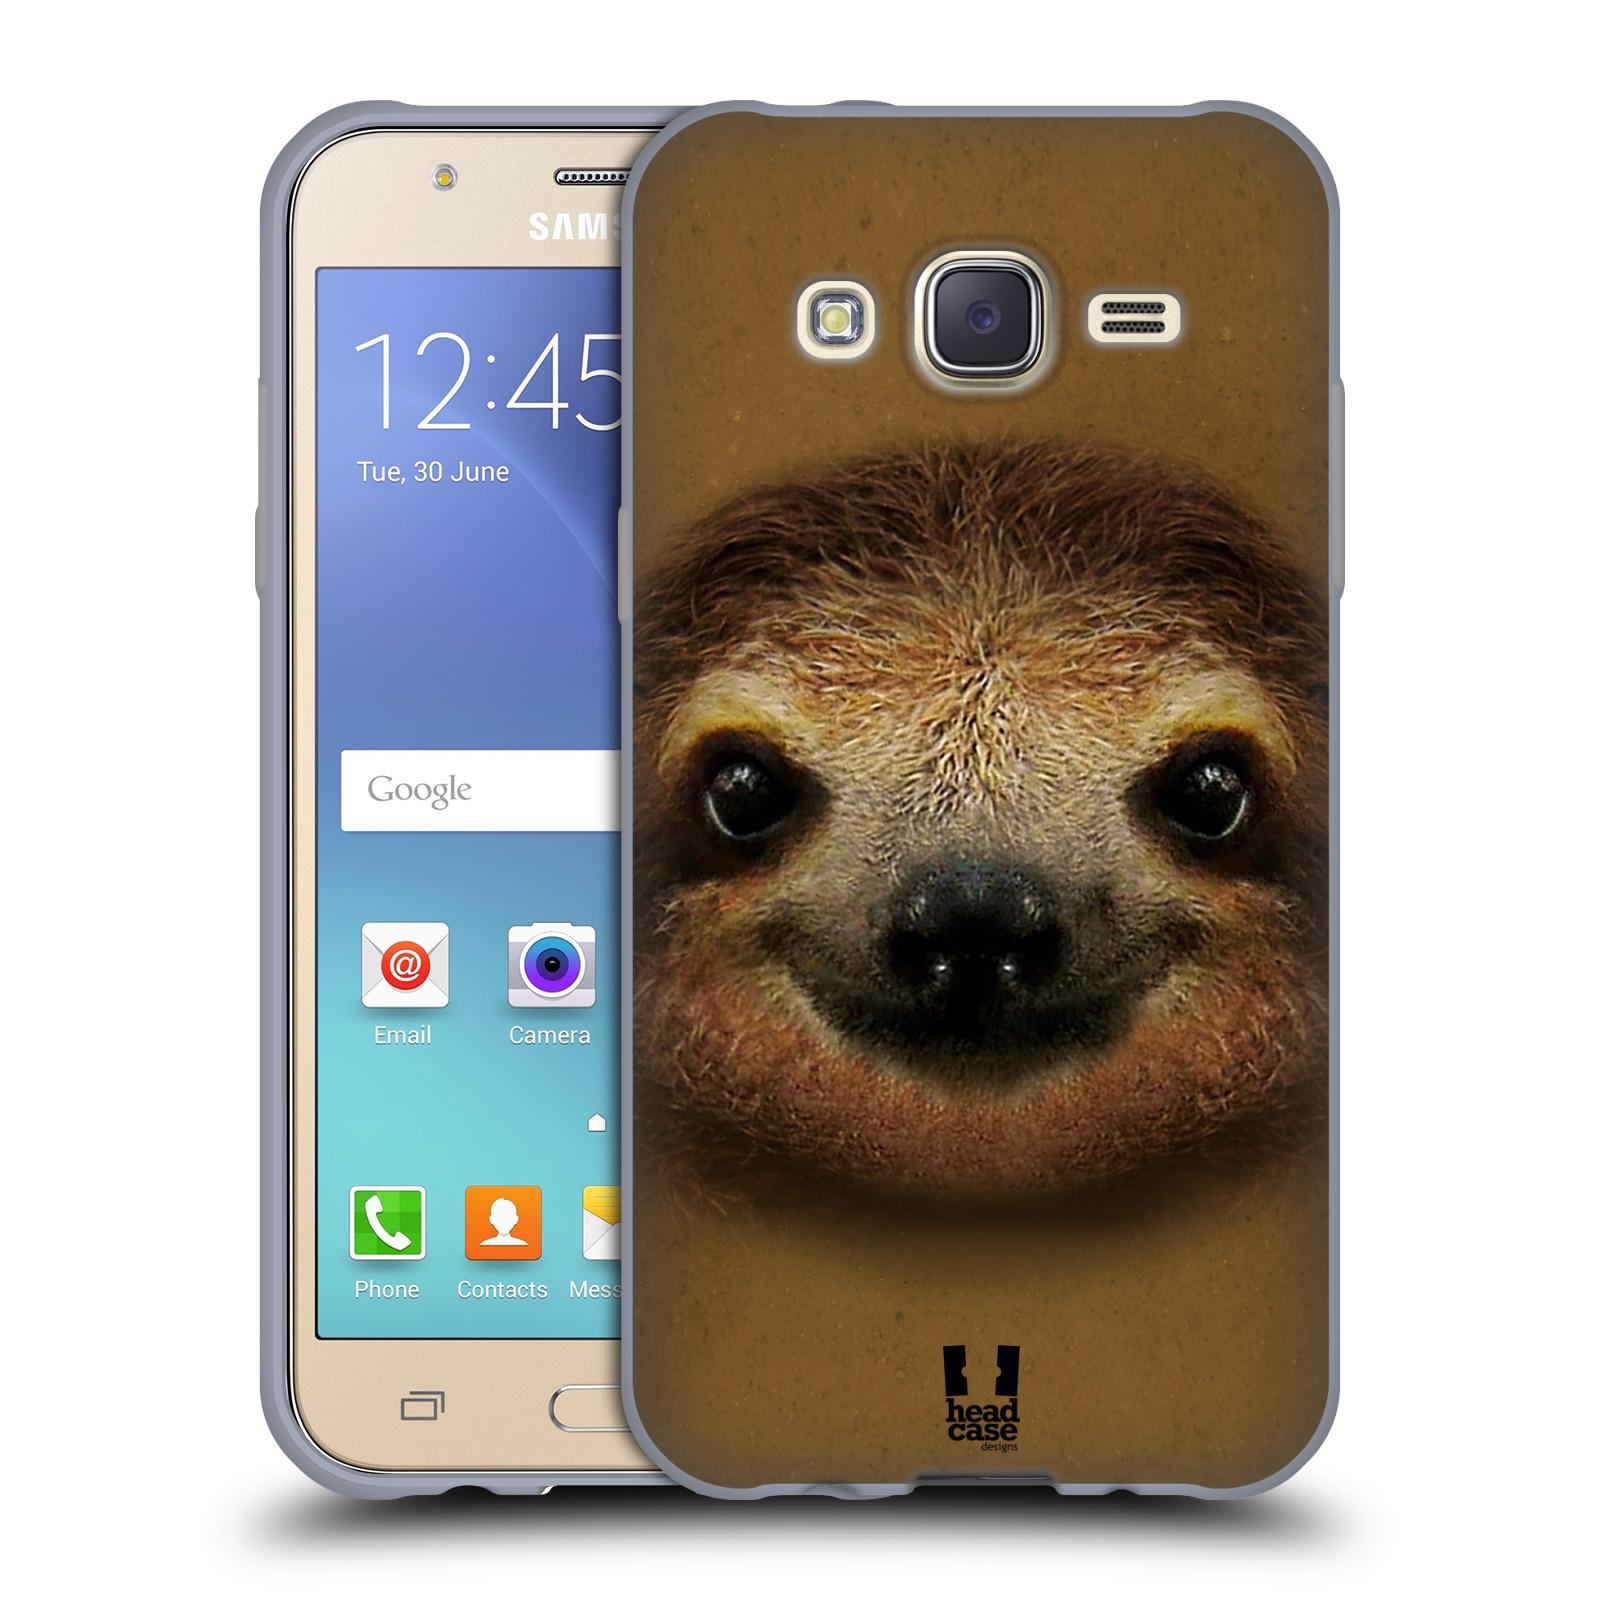 HEAD CASE silikonový obal na mobil Samsung Galaxy J5, J500, (J5 DUOS) vzor Zvířecí tváře 2 lenochod